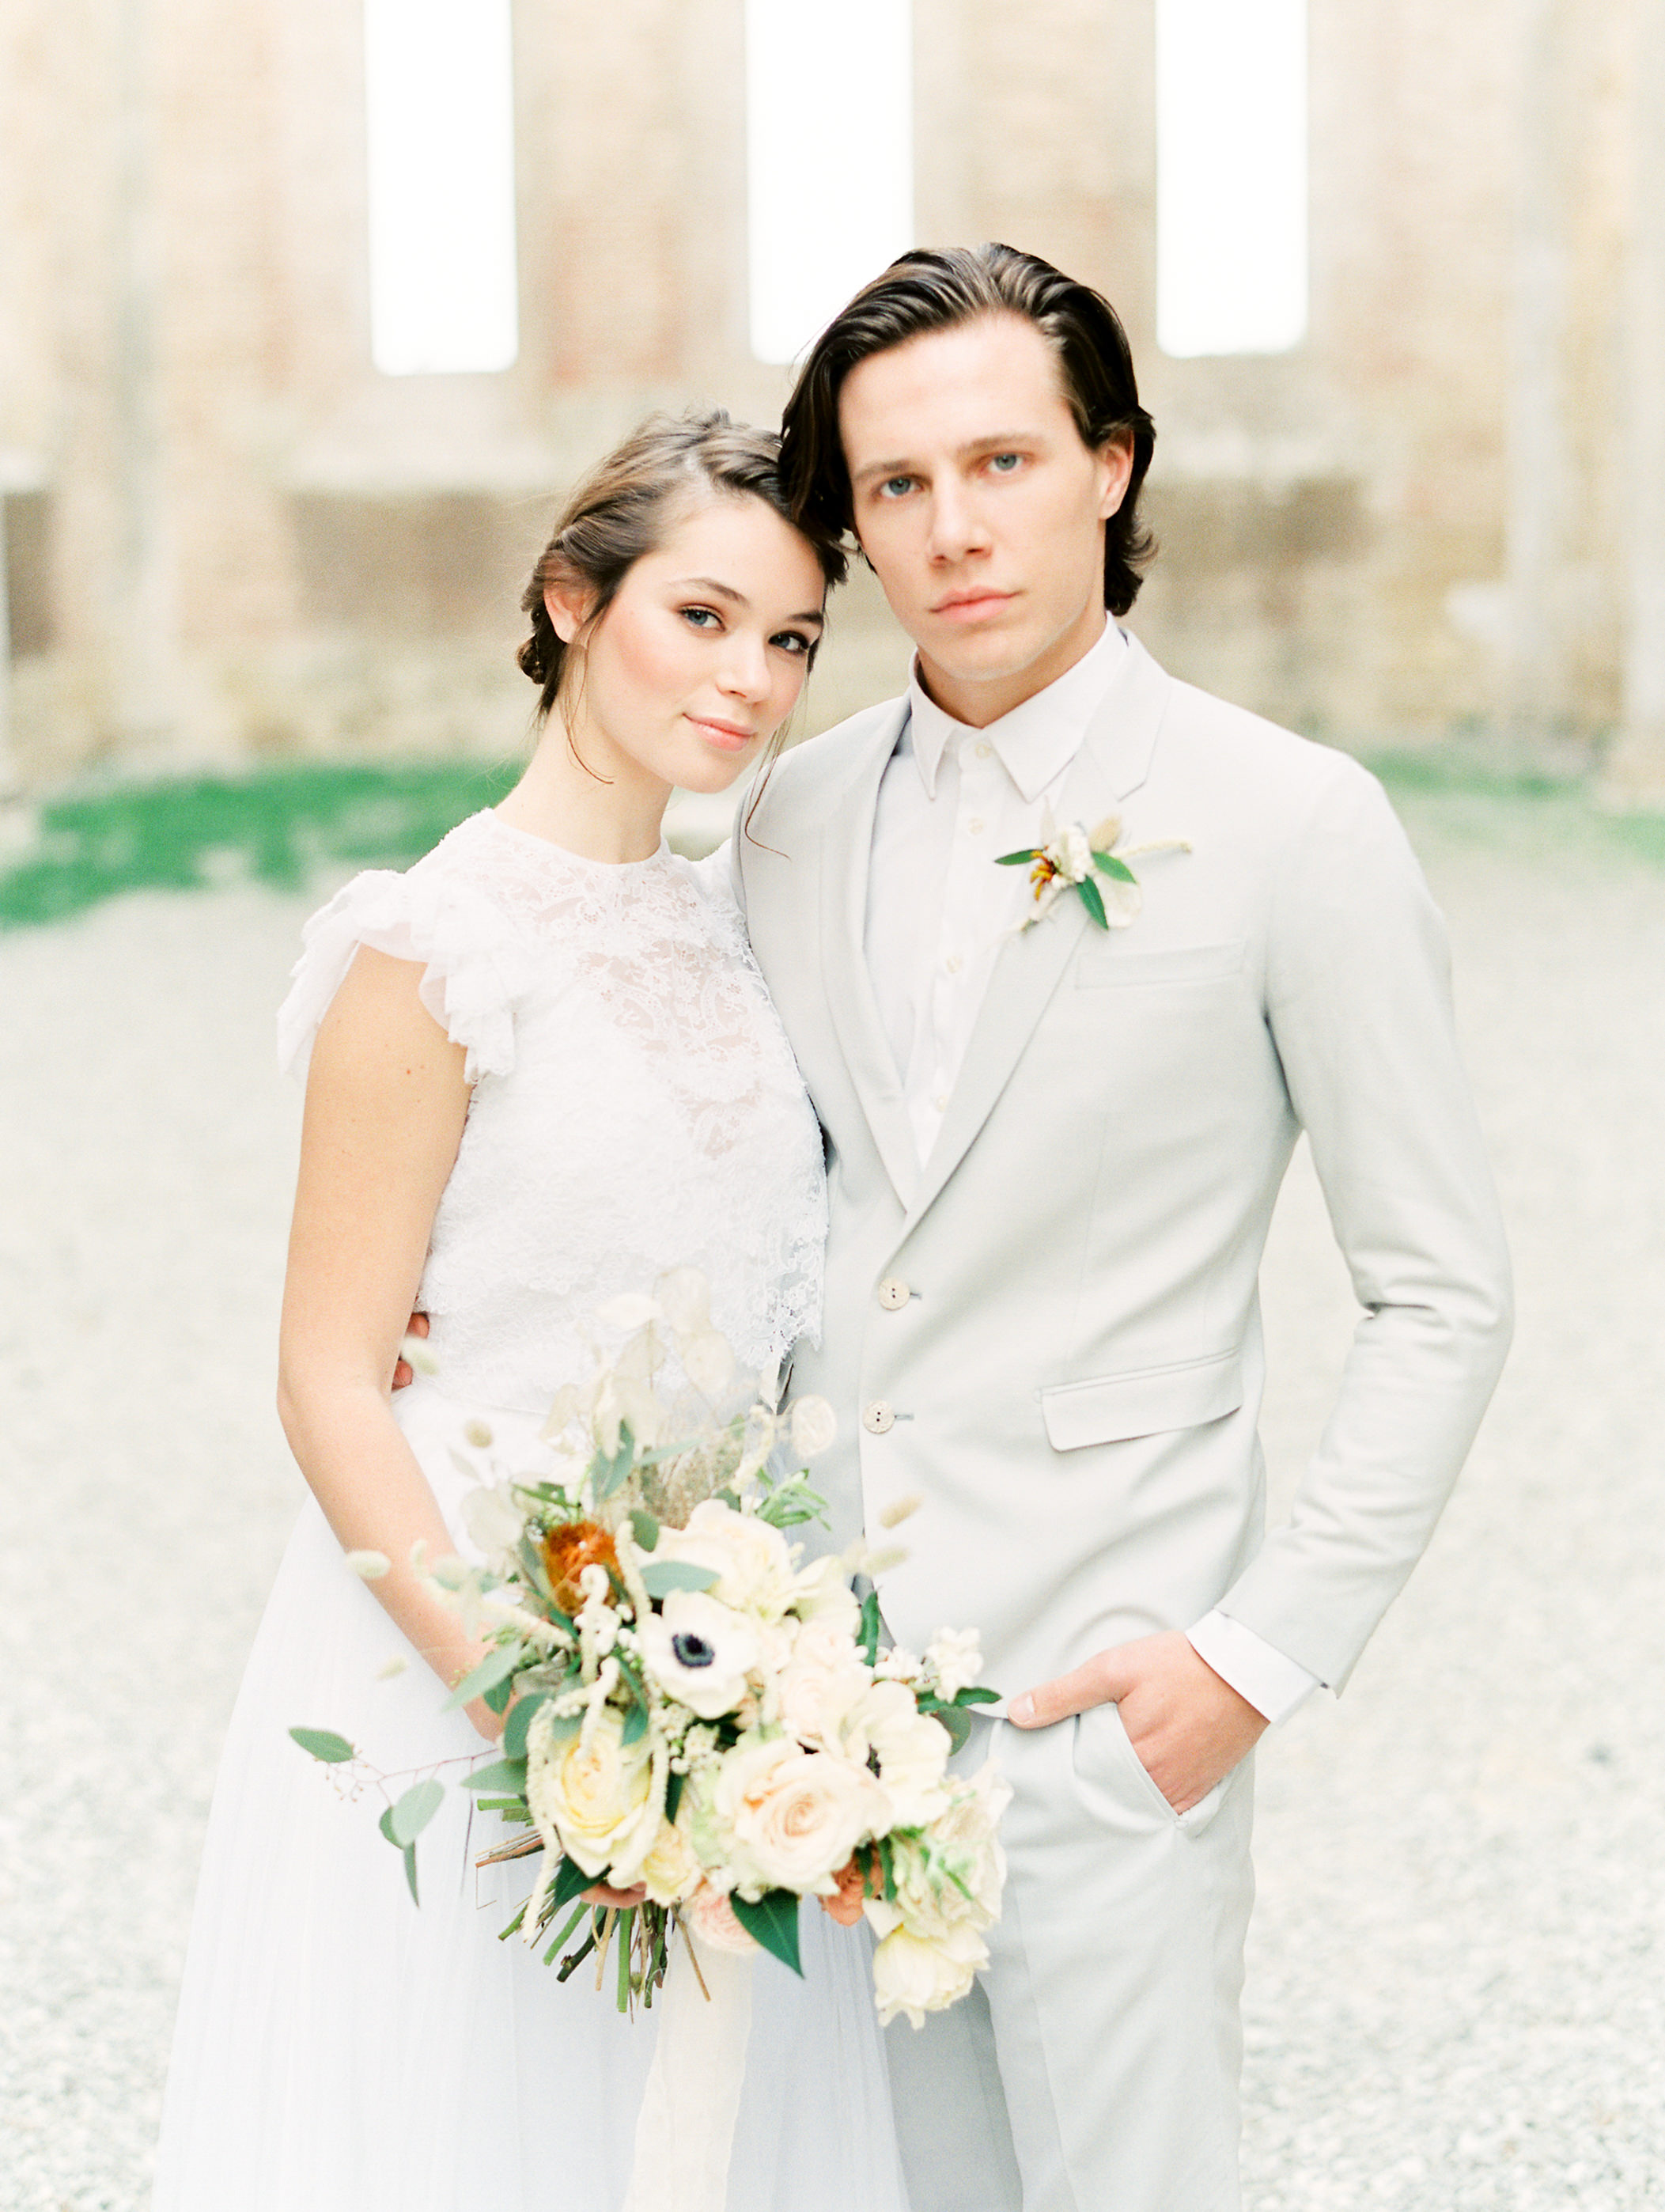 romantic-italy-wedding-in-tuscany-16.jpg